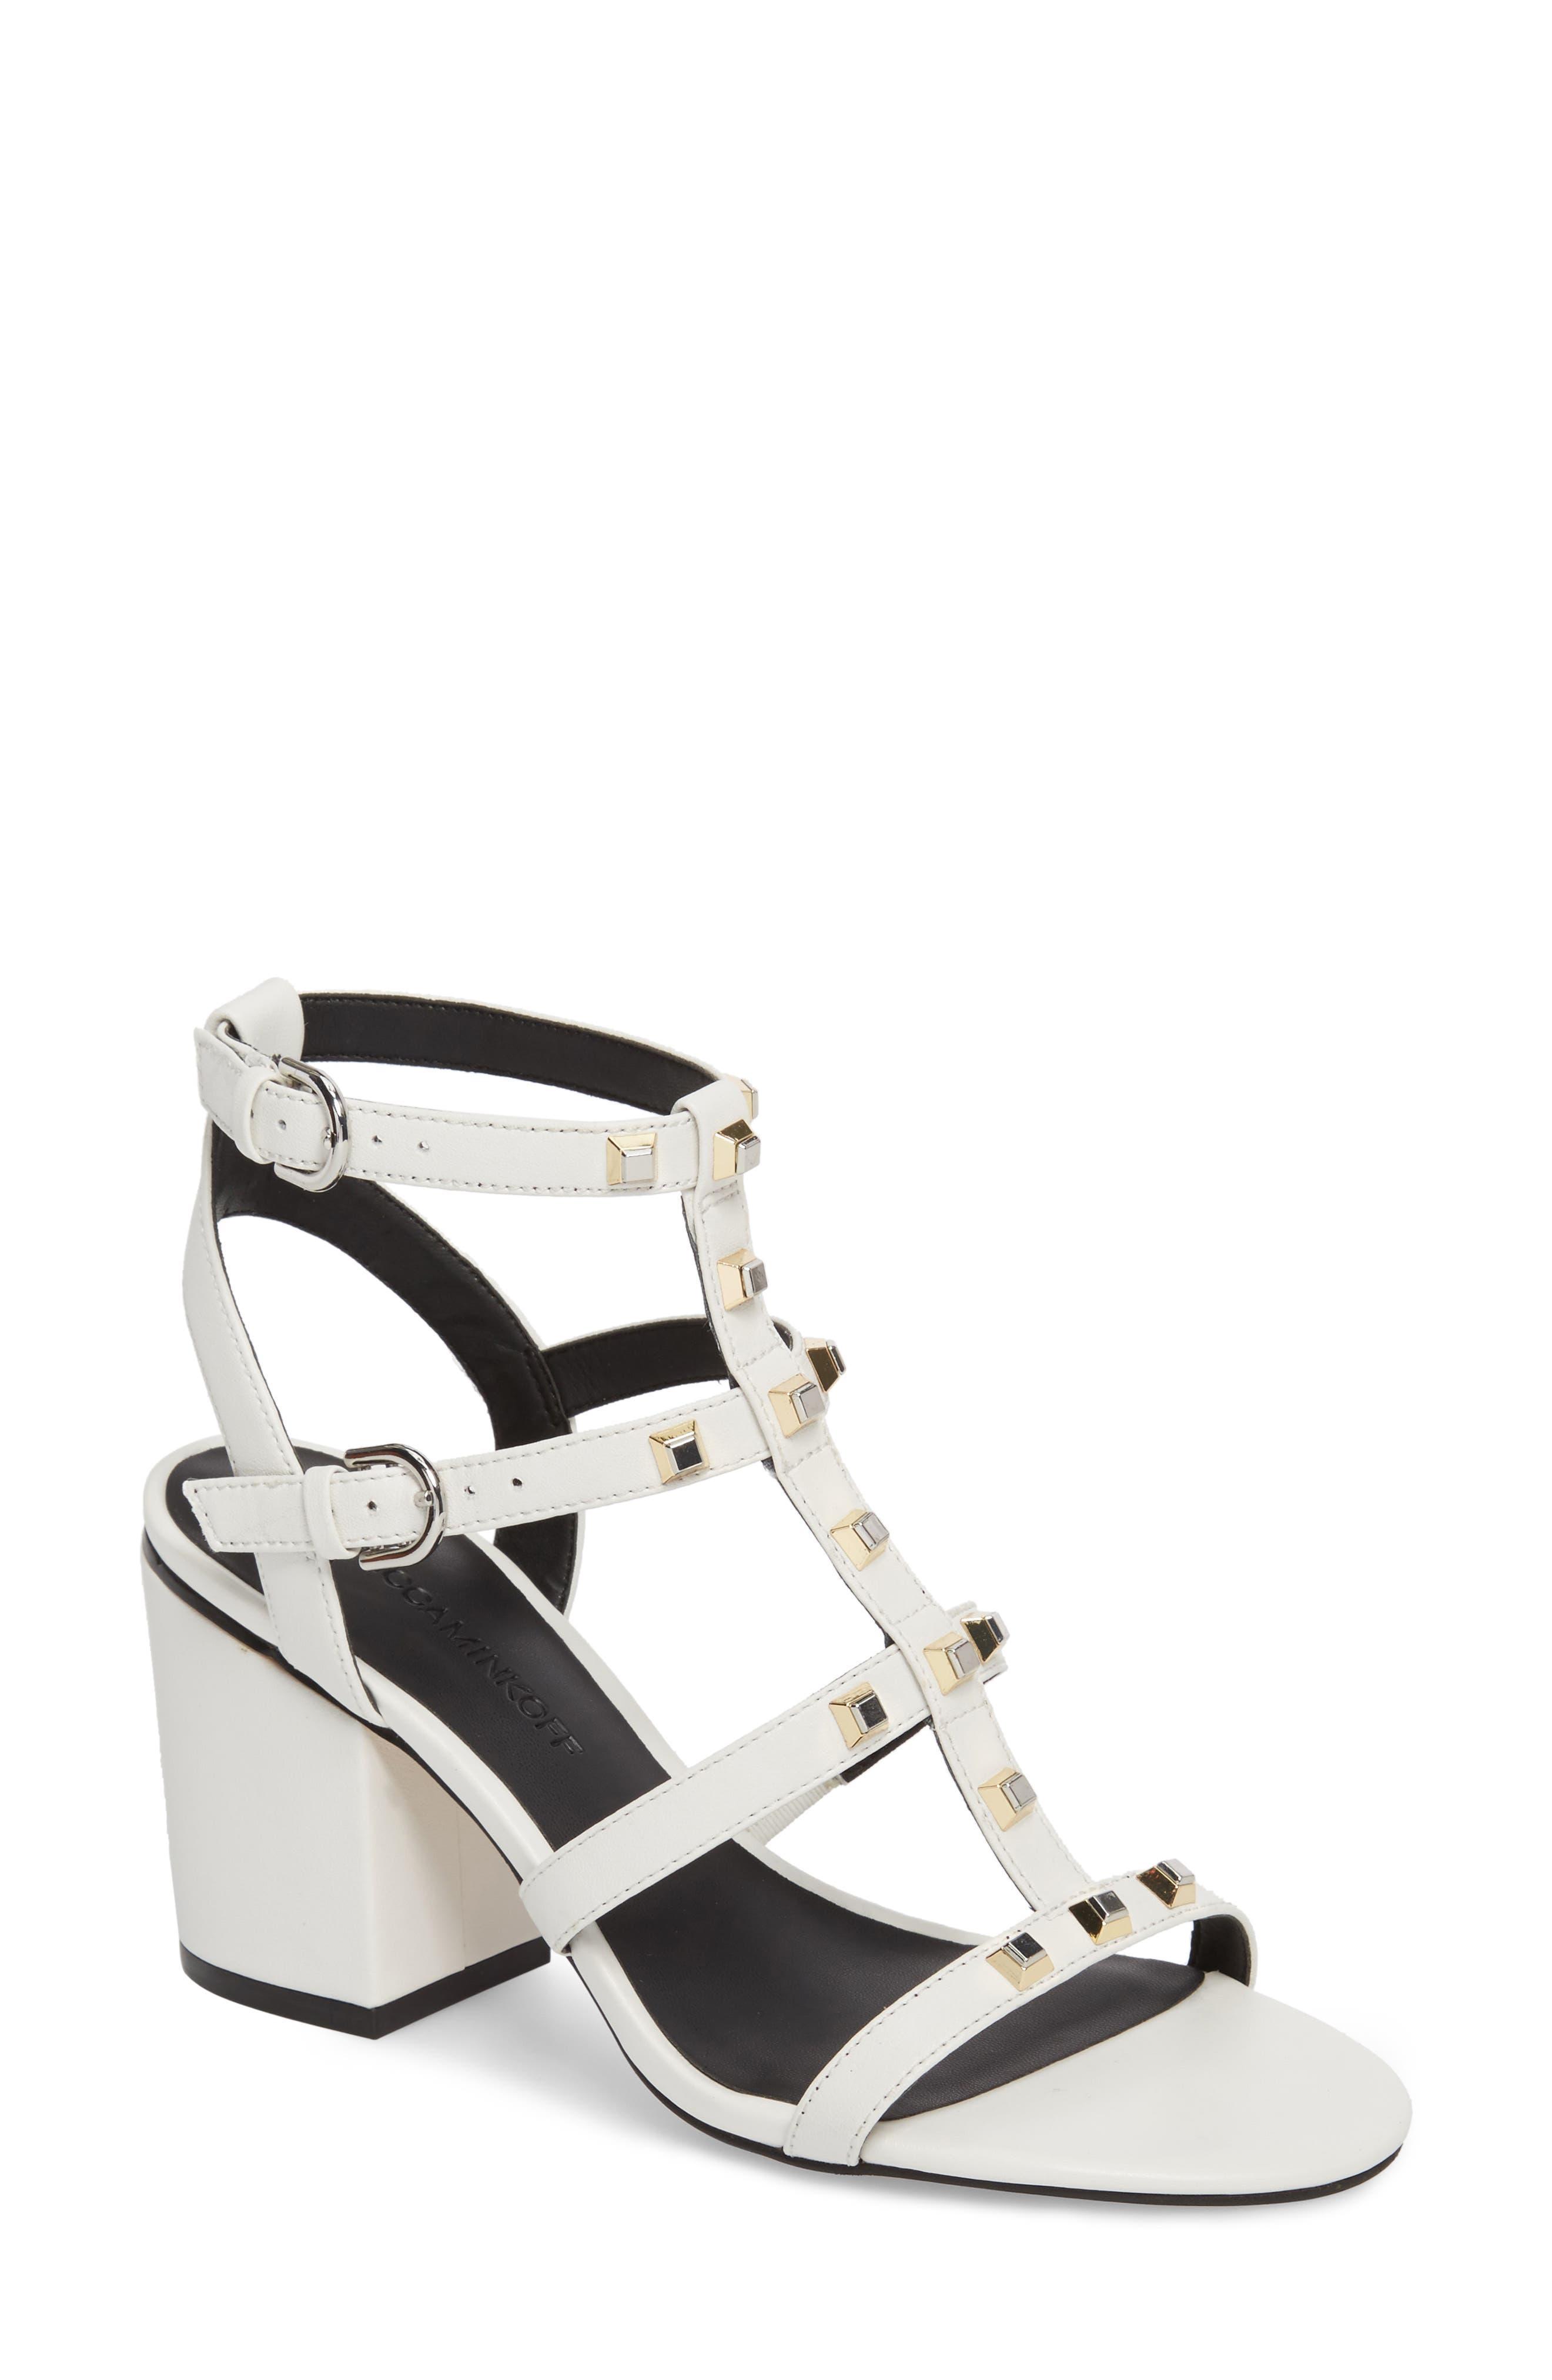 Lenore Sandal,                             Main thumbnail 1, color,                             Optic White Leather